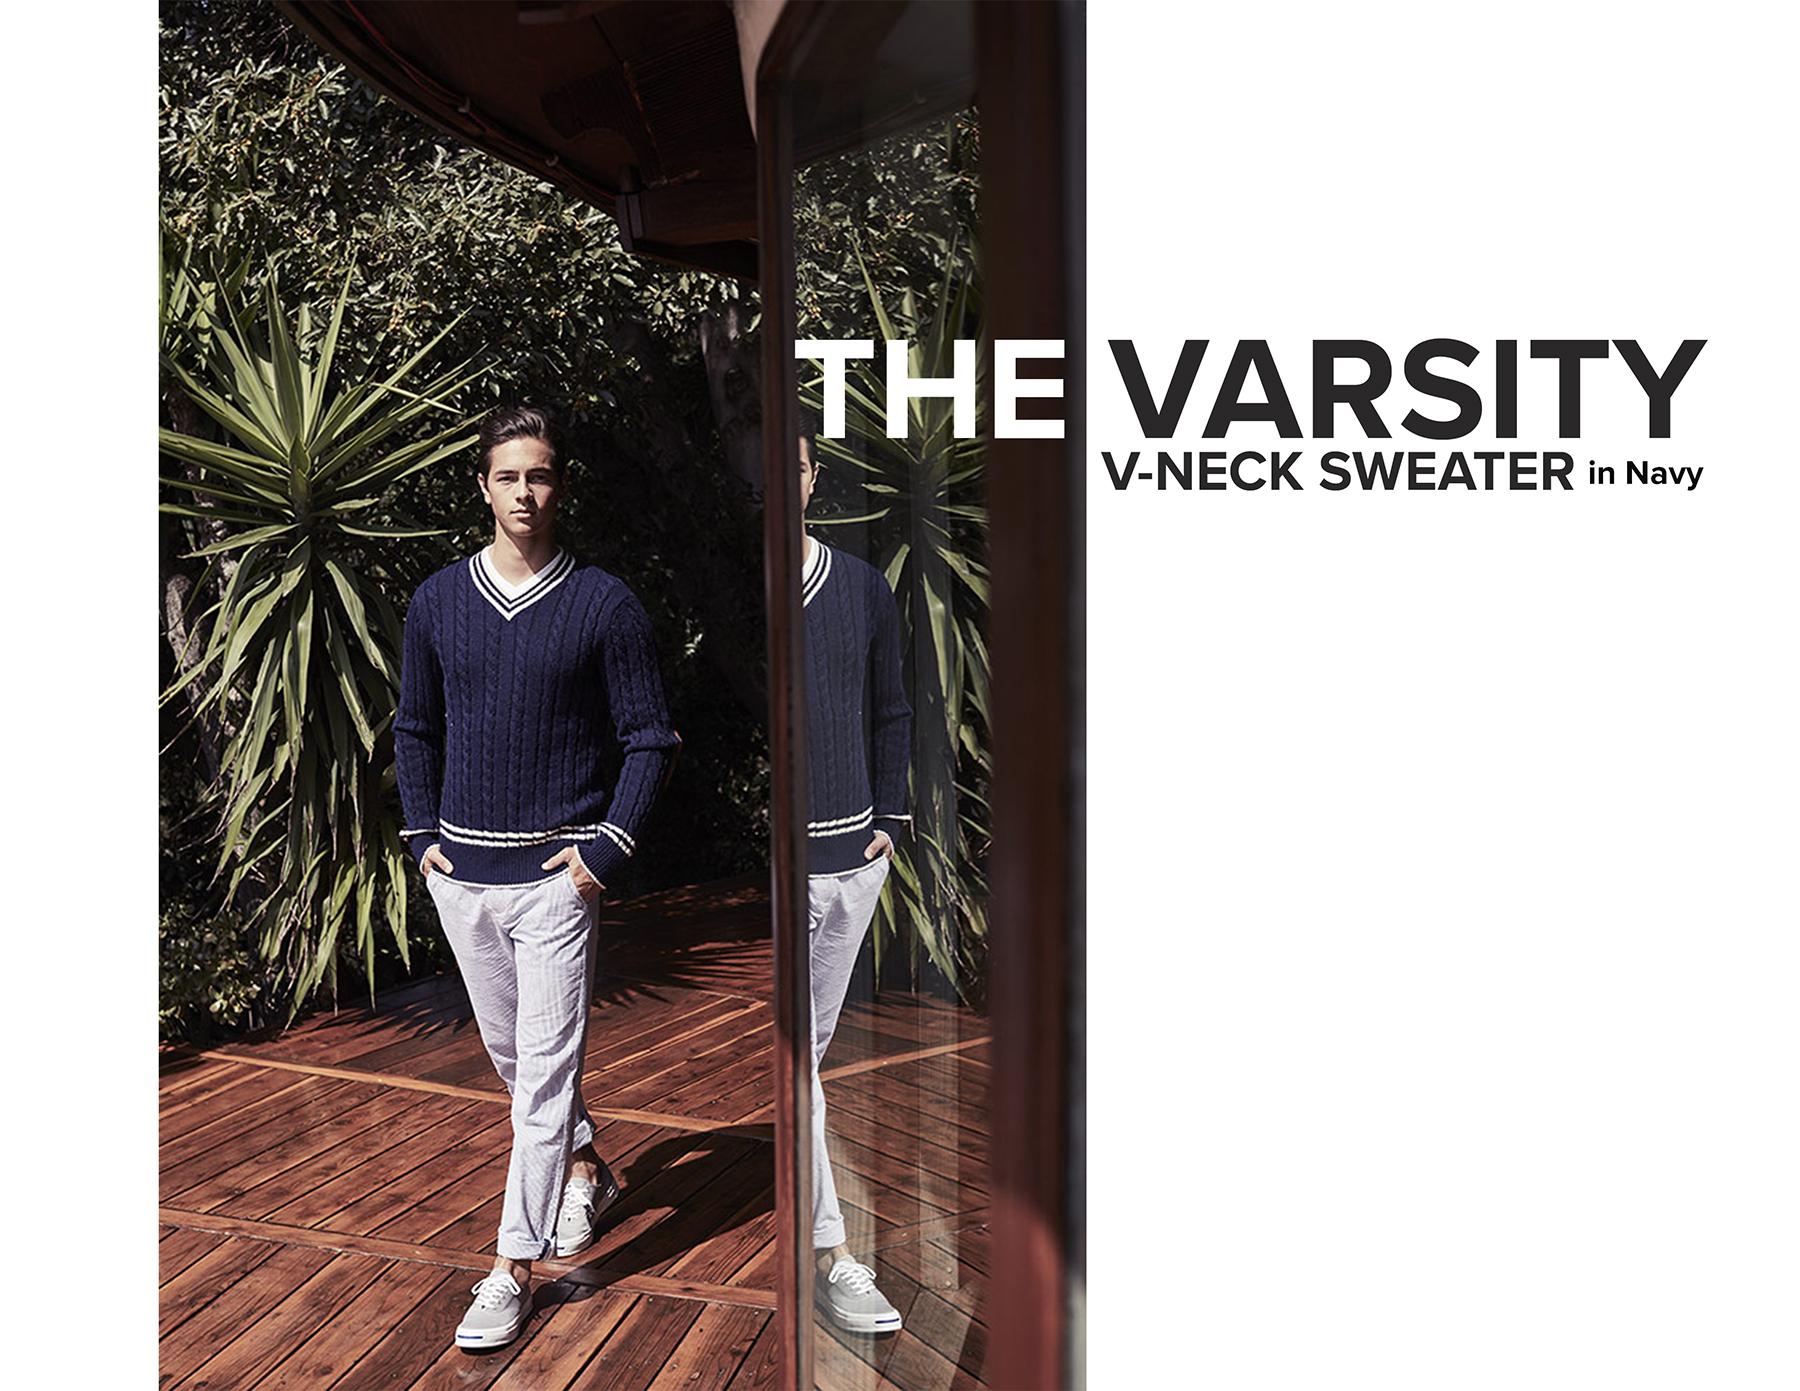 1s_3_The Varsity Sweater Title_navy_Editorial.jpg